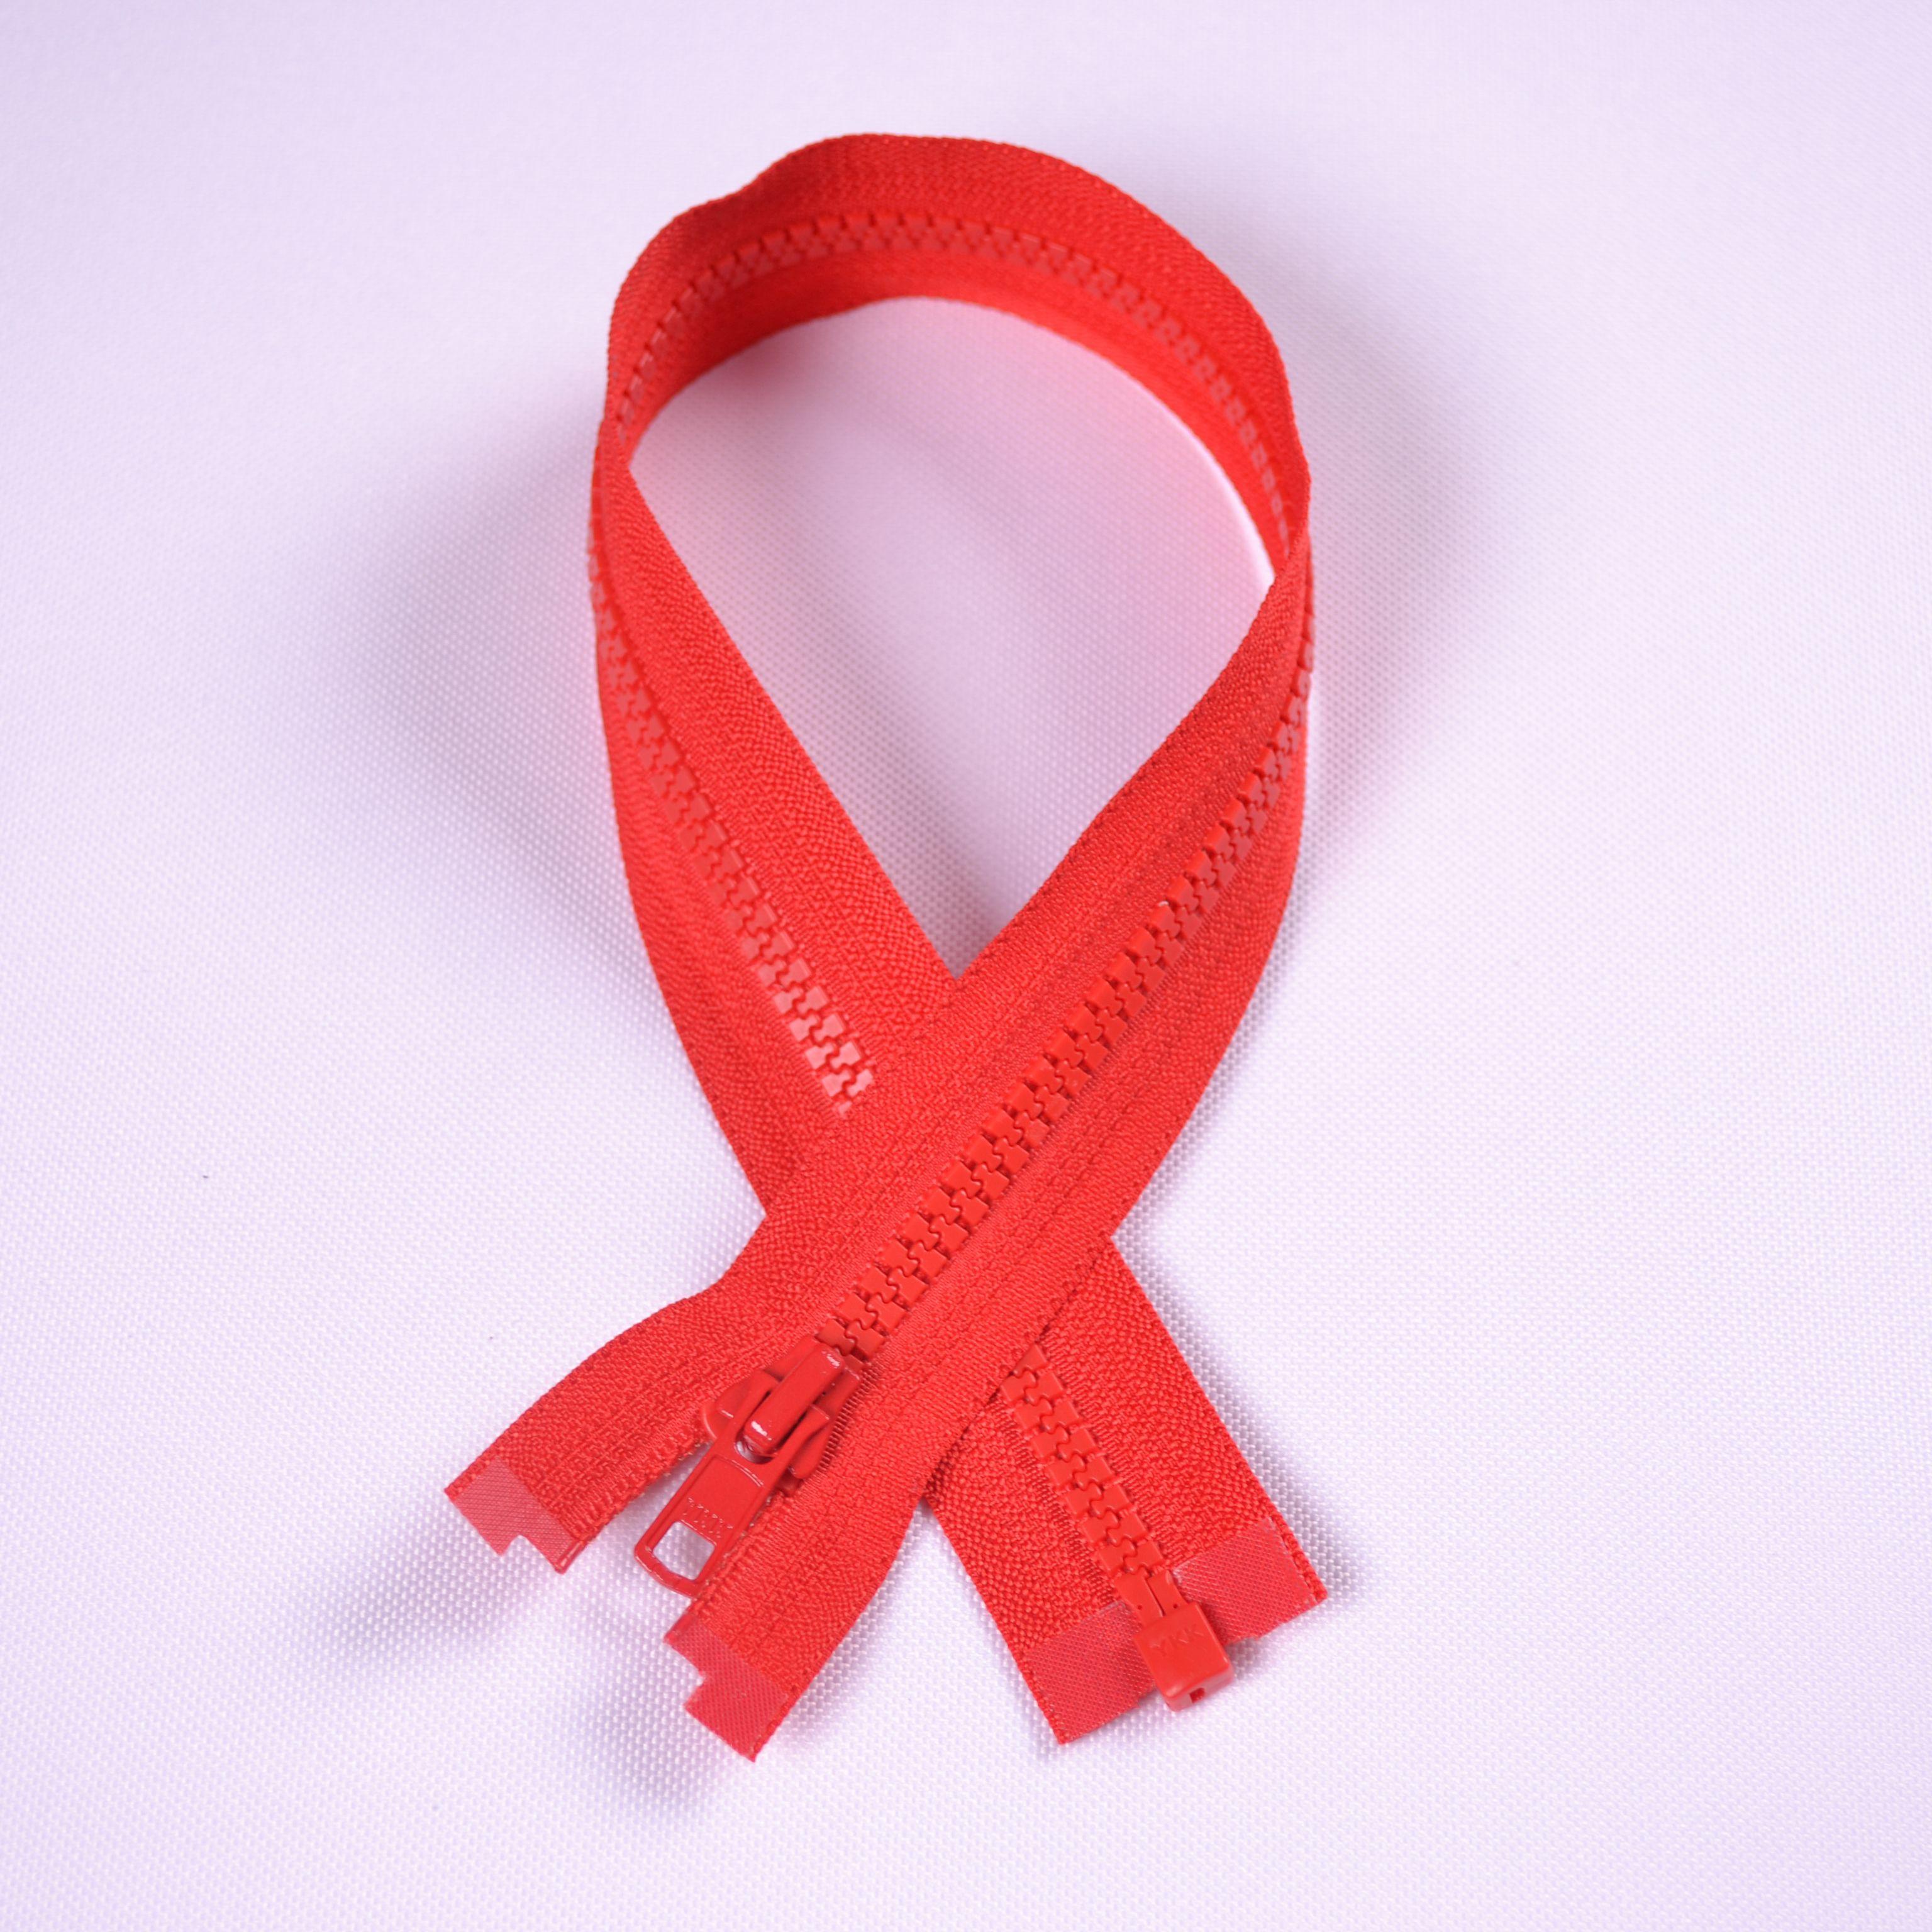 zips-ykk-kostený-deliteľný-5-mm---červená-55-cm